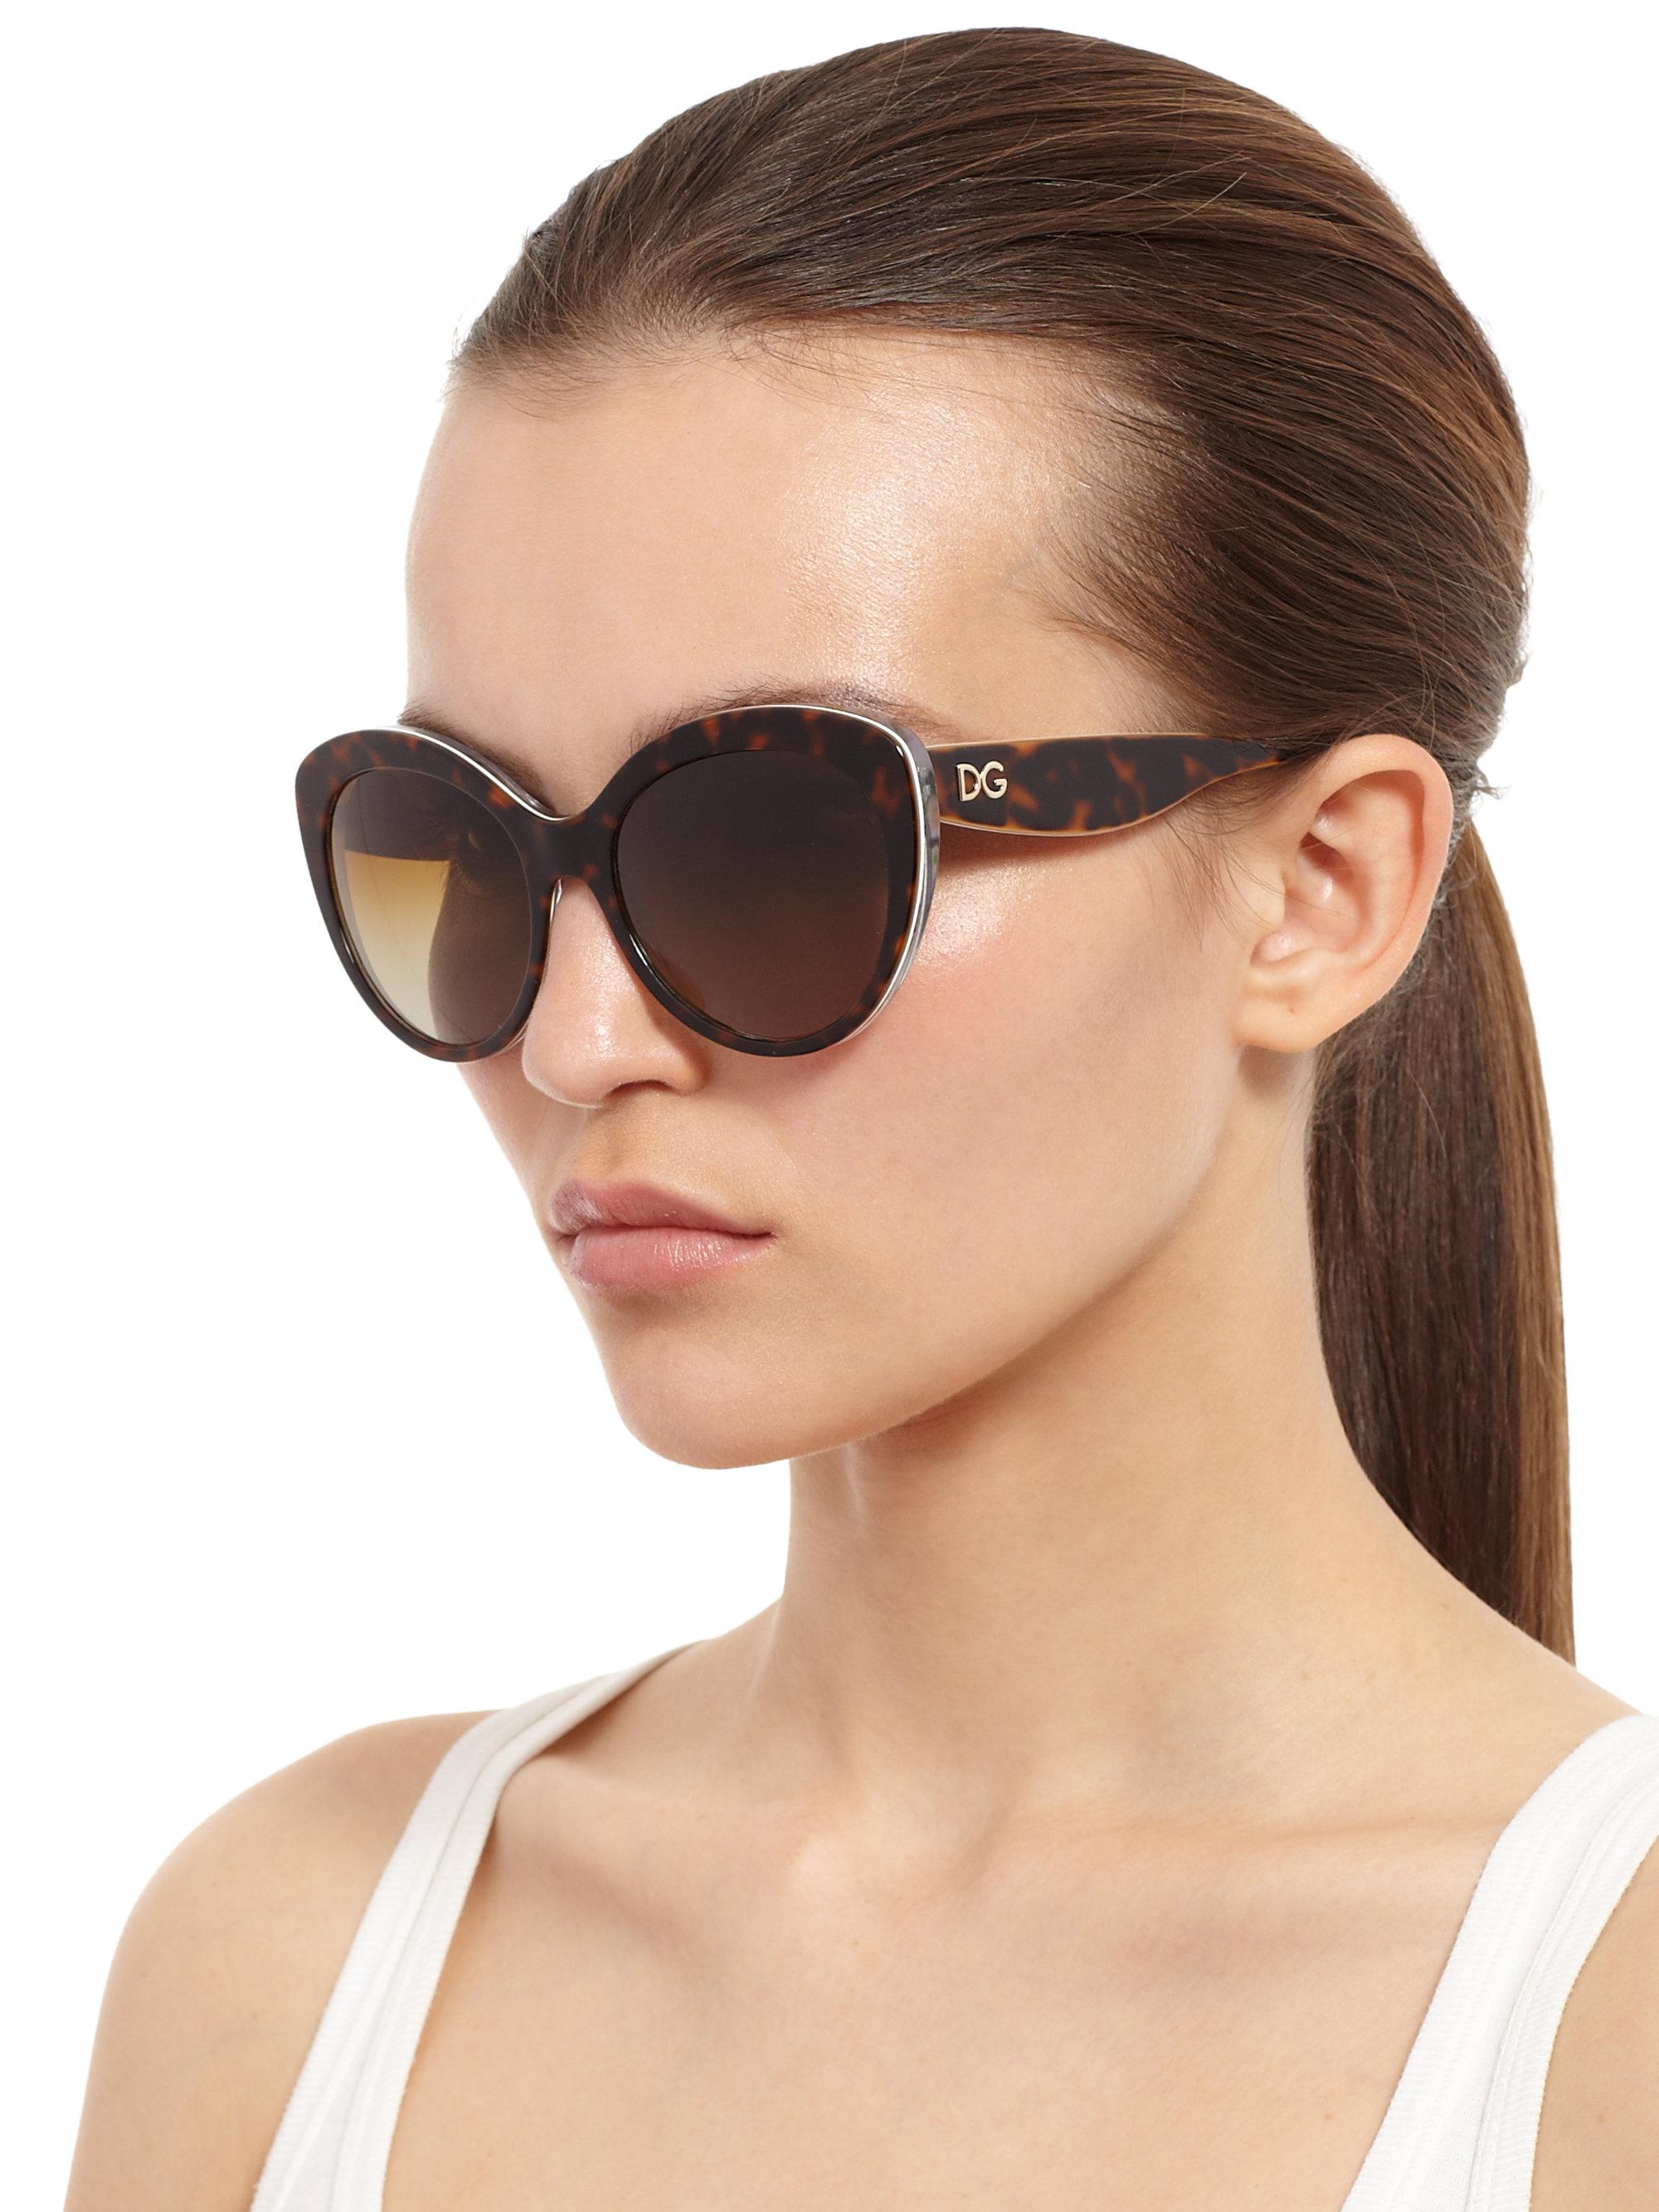 Lyst - Dolce & Gabbana Multi-Print Cat'S-Eye Sunglasses in